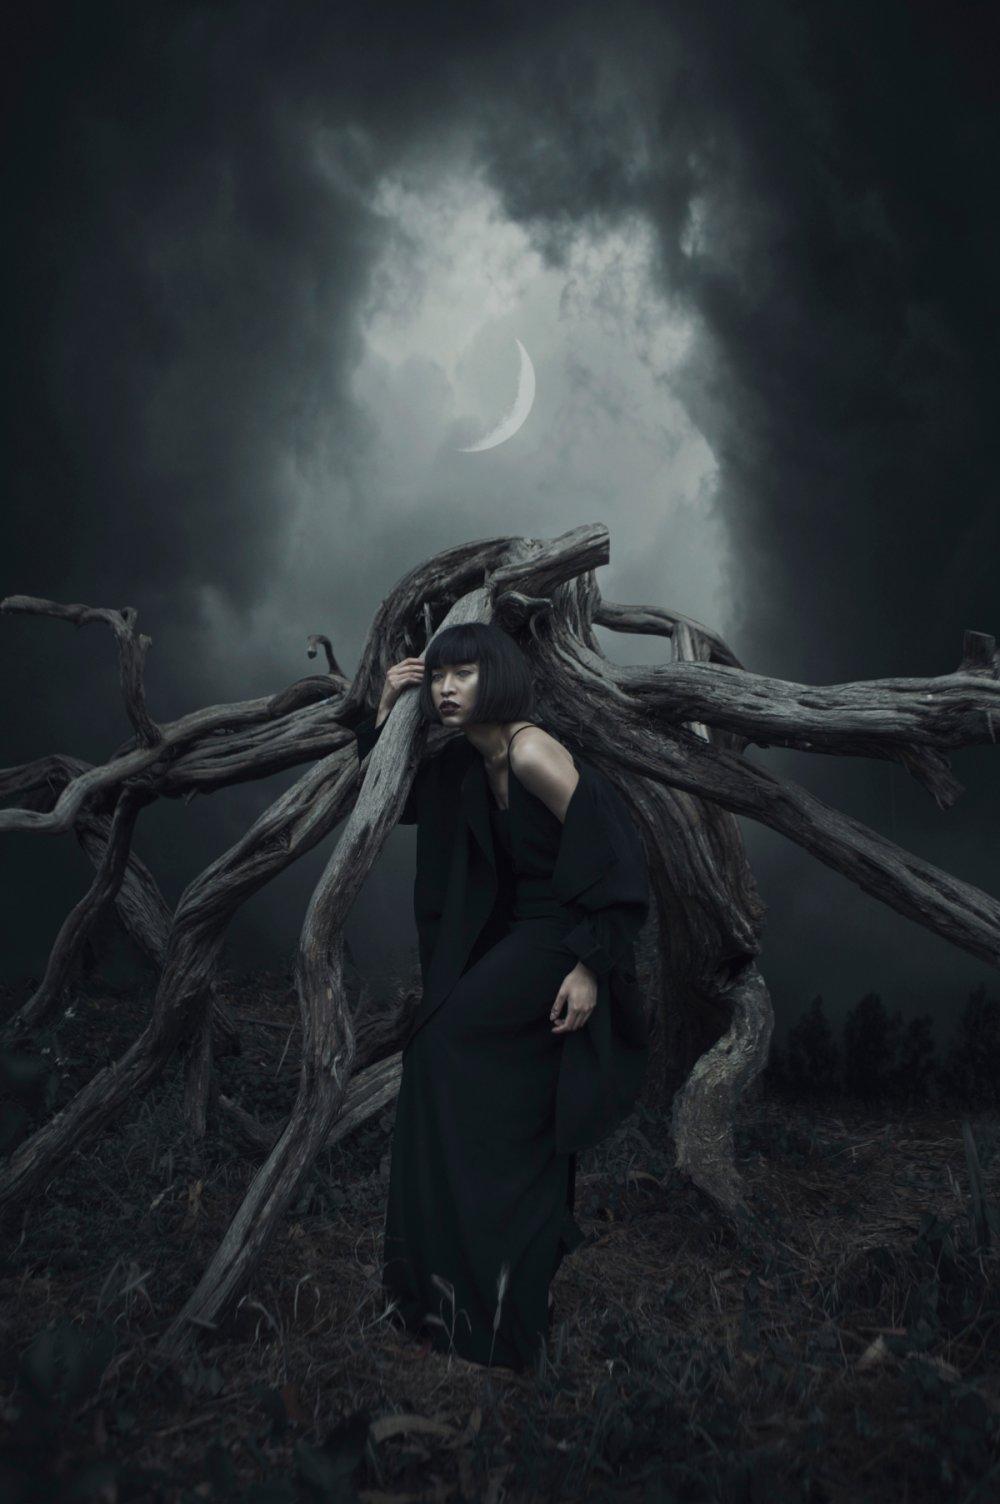 The Dark And Arcane Photography Of Karina Boissonnier 1